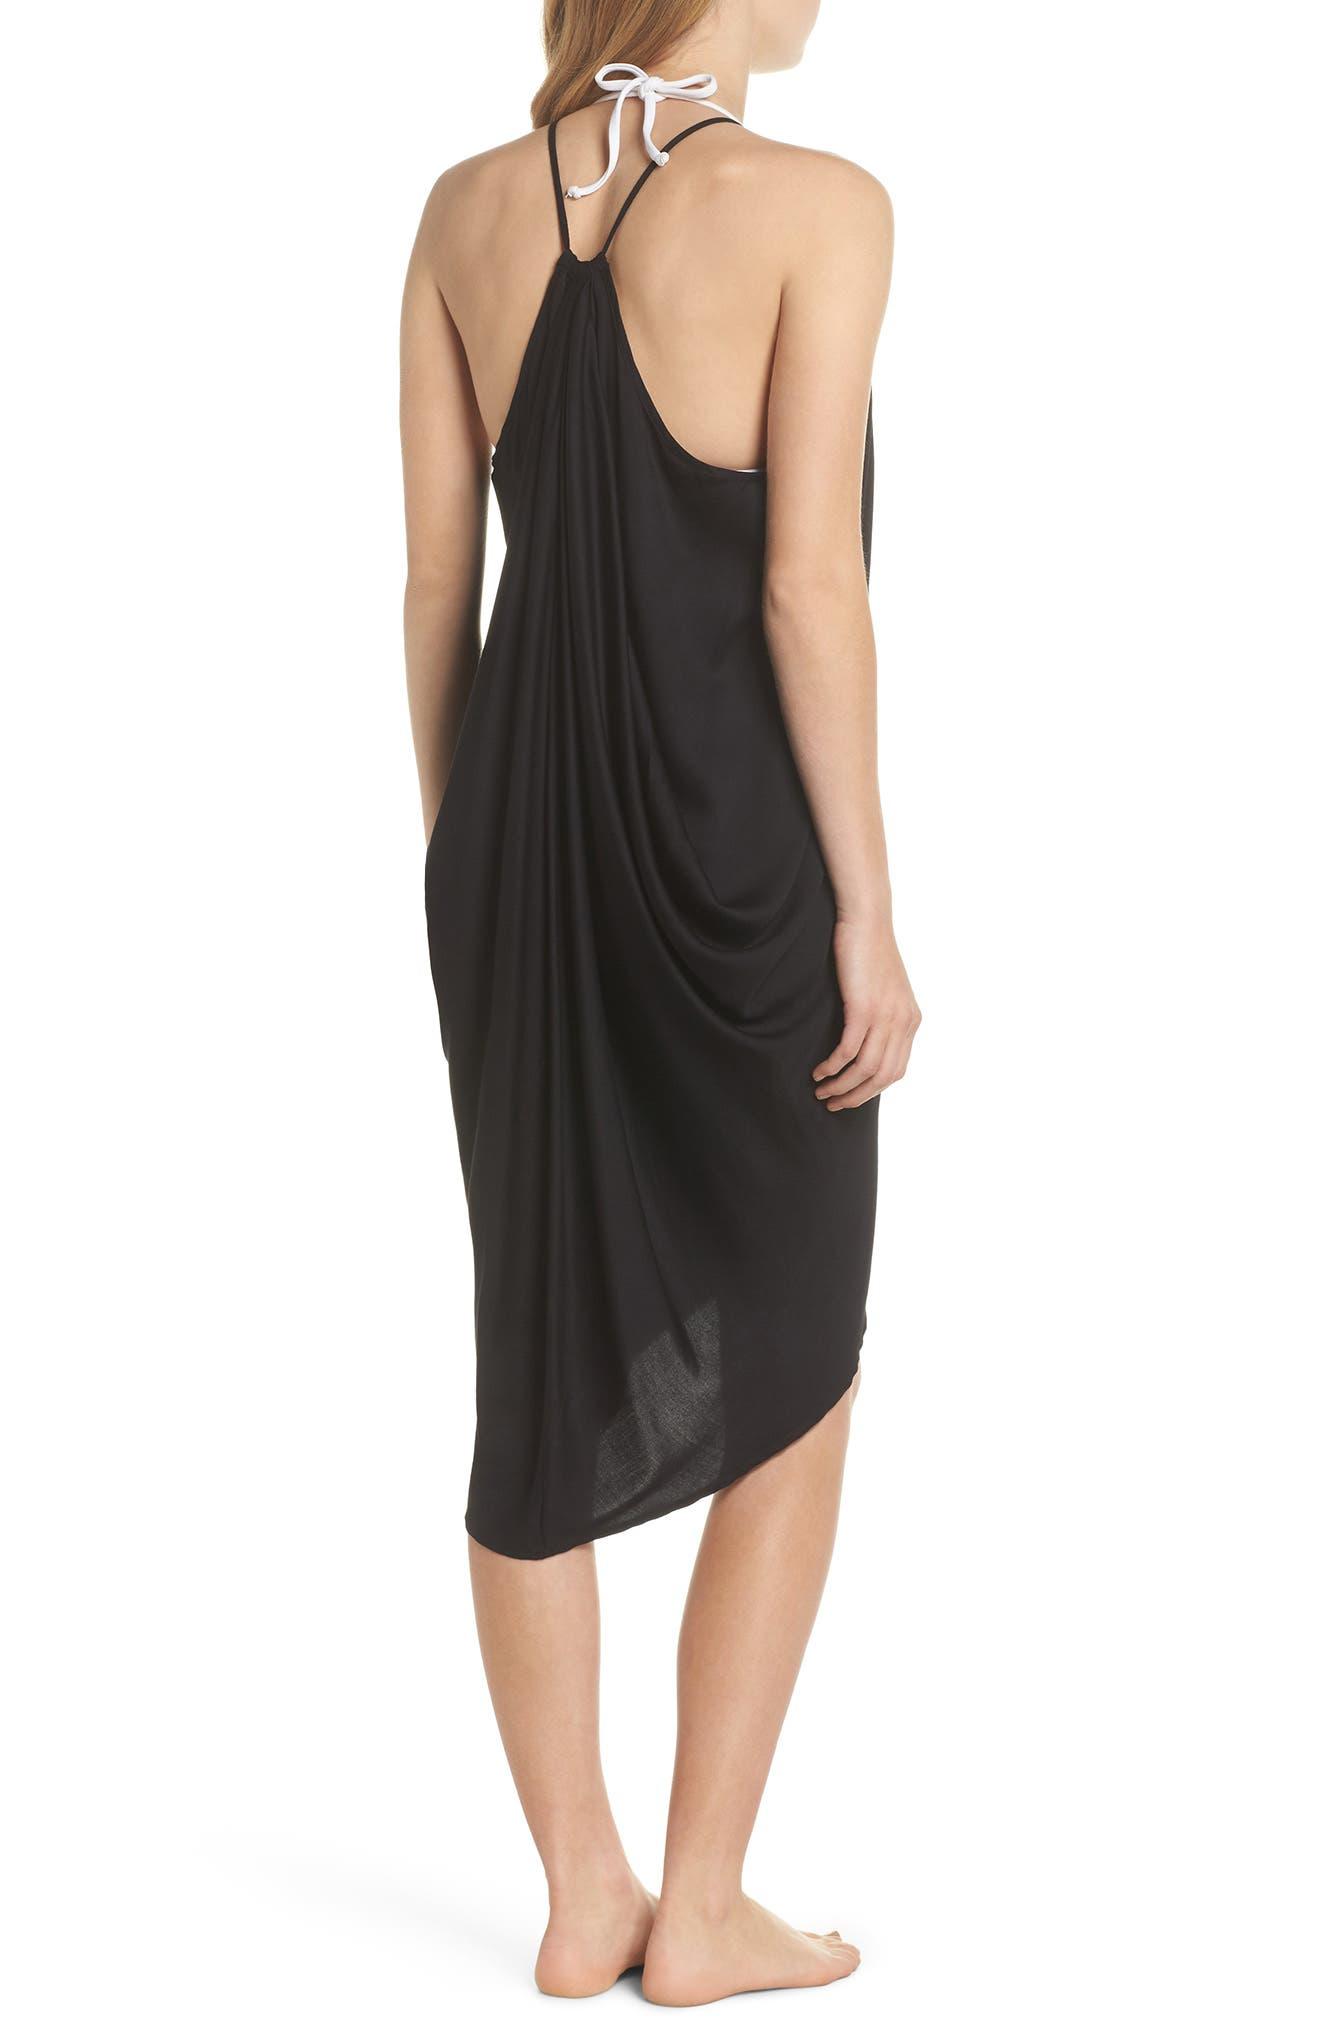 California Core Pali Wrap Cover-Up Dress,                             Alternate thumbnail 2, color,                             Black